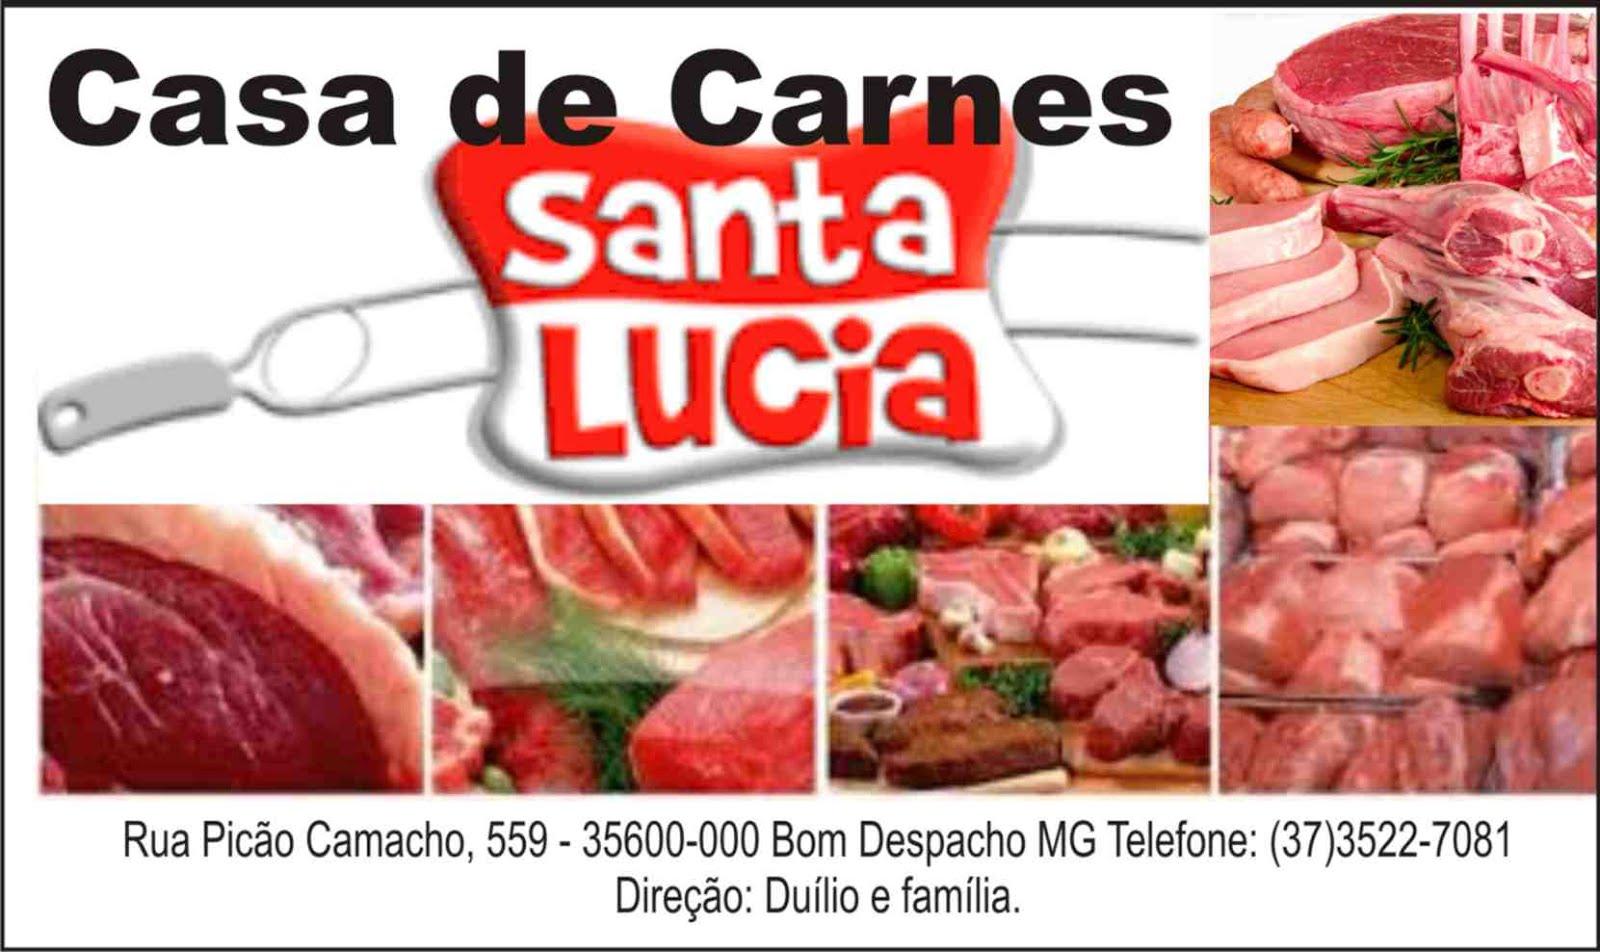 Casa de Carnes Santa Lúcia